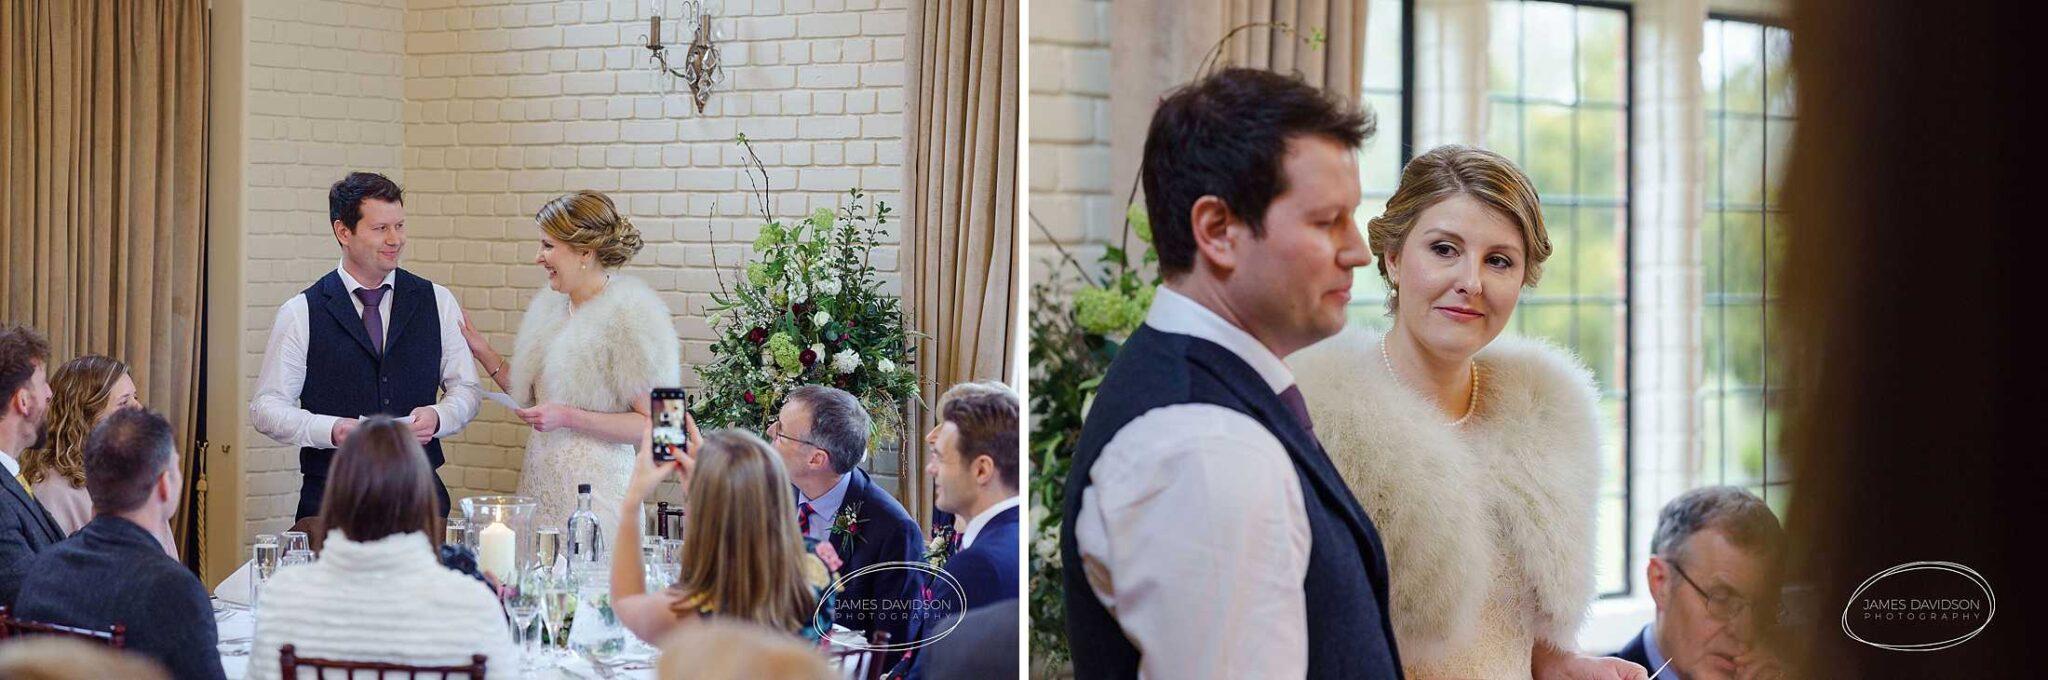 seckford-hall-wedding-068